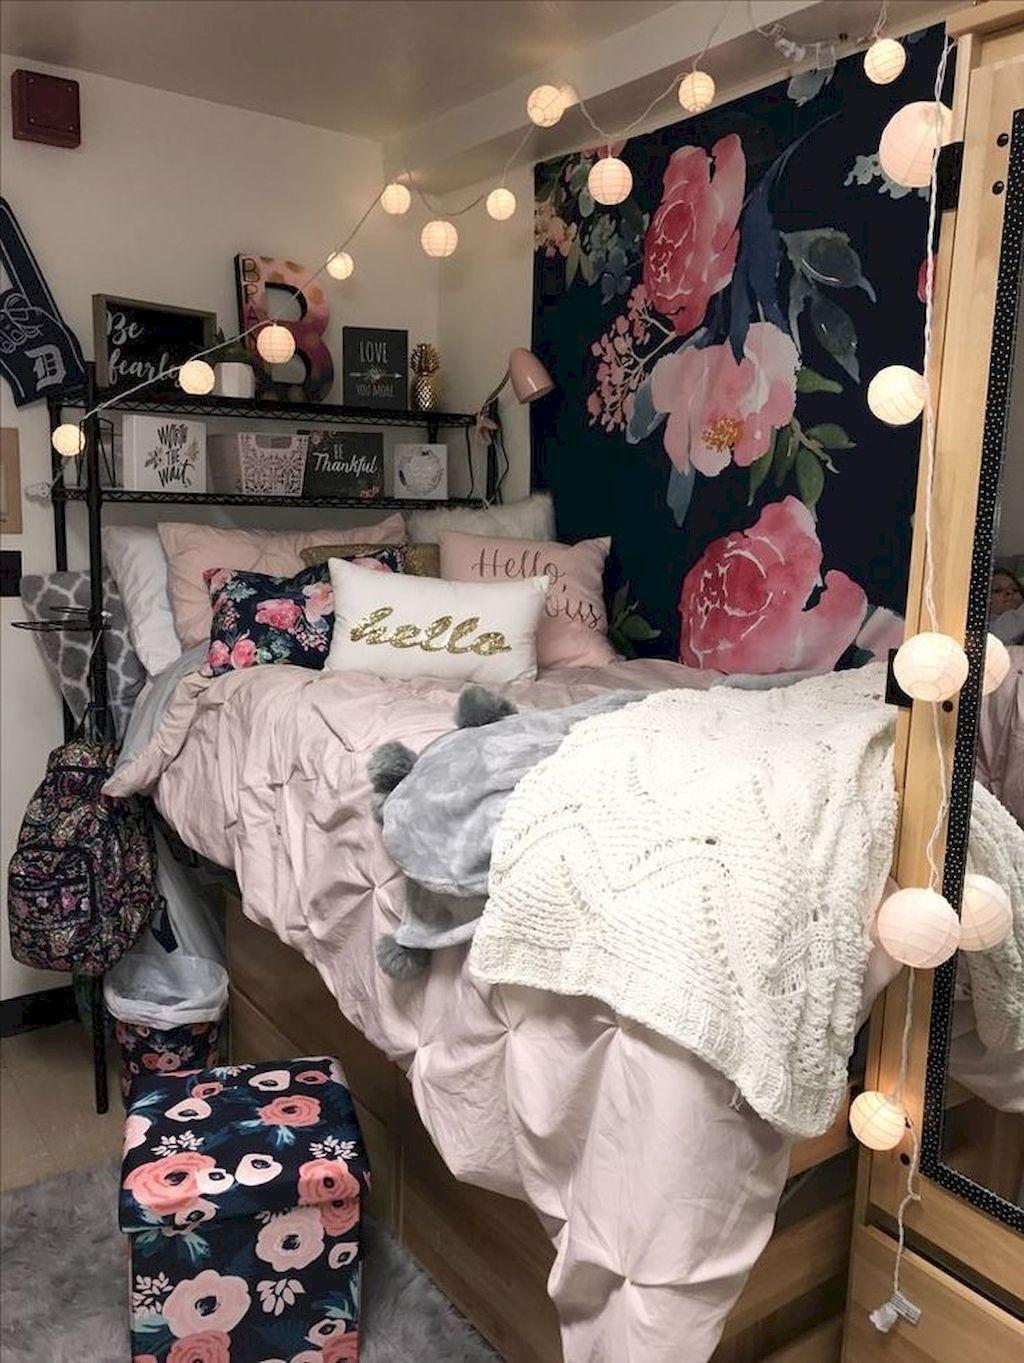 Cute Dorm Room Decorating Ideas On A Budget 37 Dorm Room